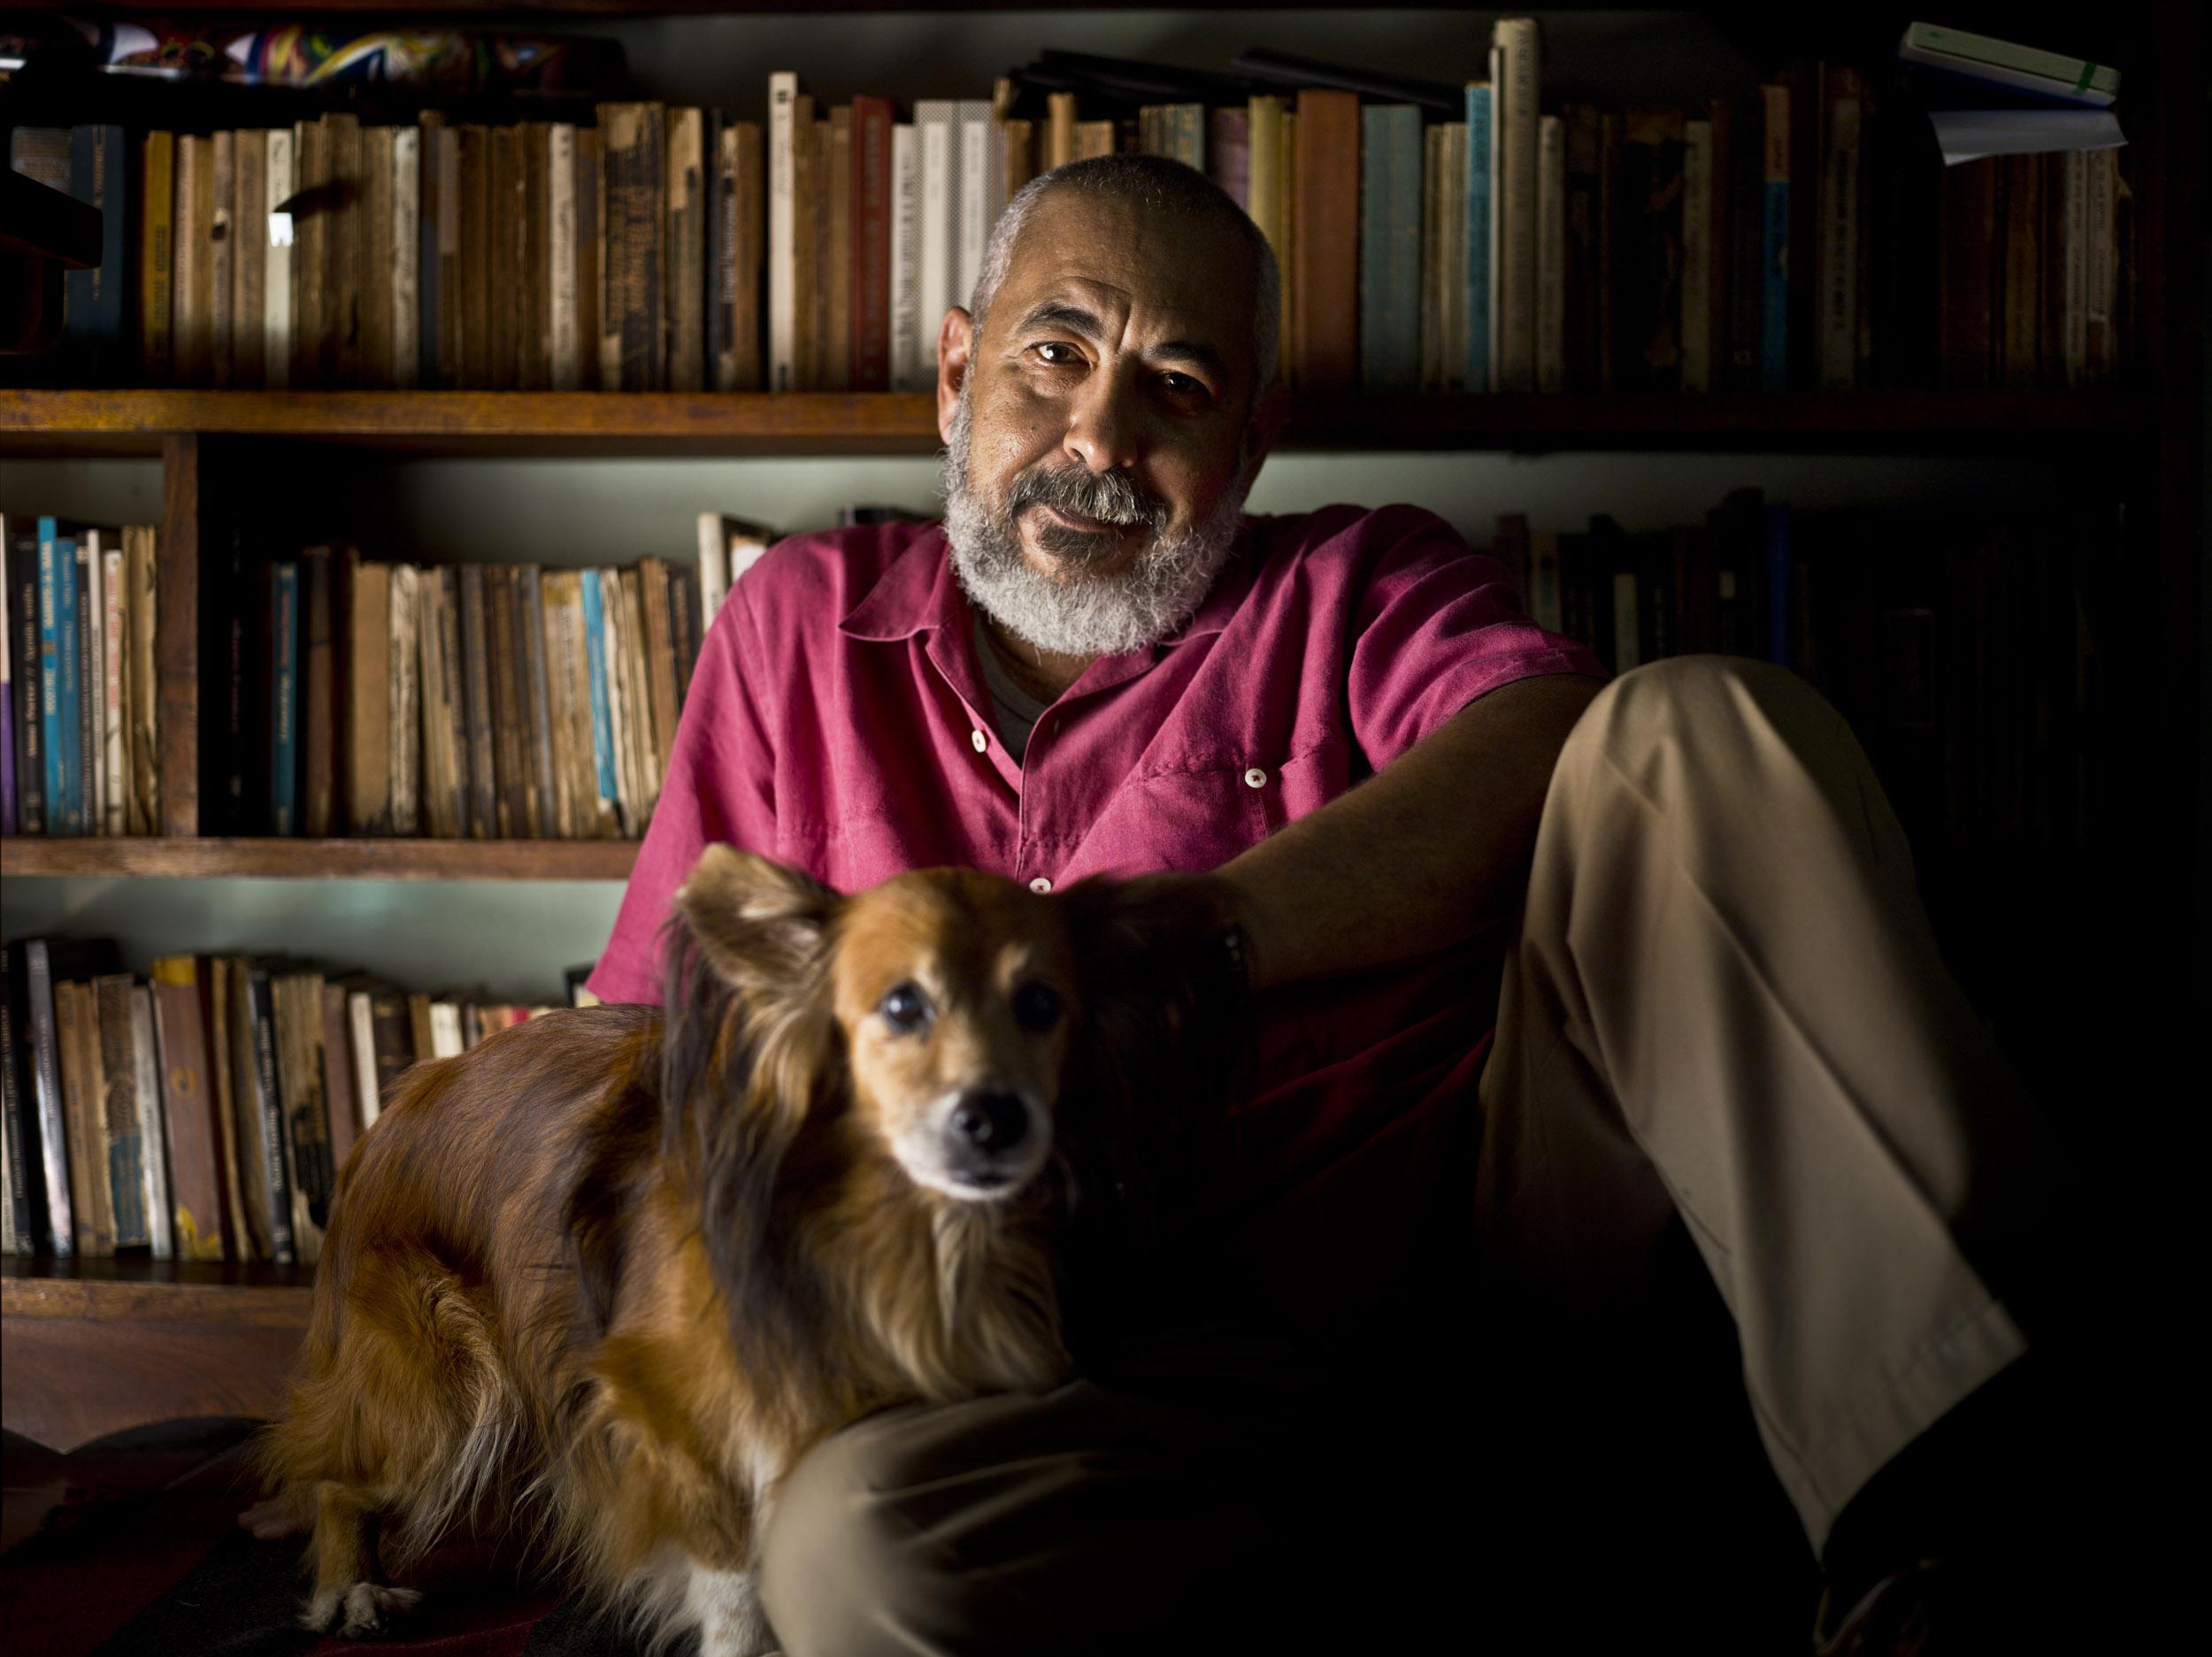 Leonardo Padura, writer - Illuminated Cuba - Hector Garrido, Aerial and human photography